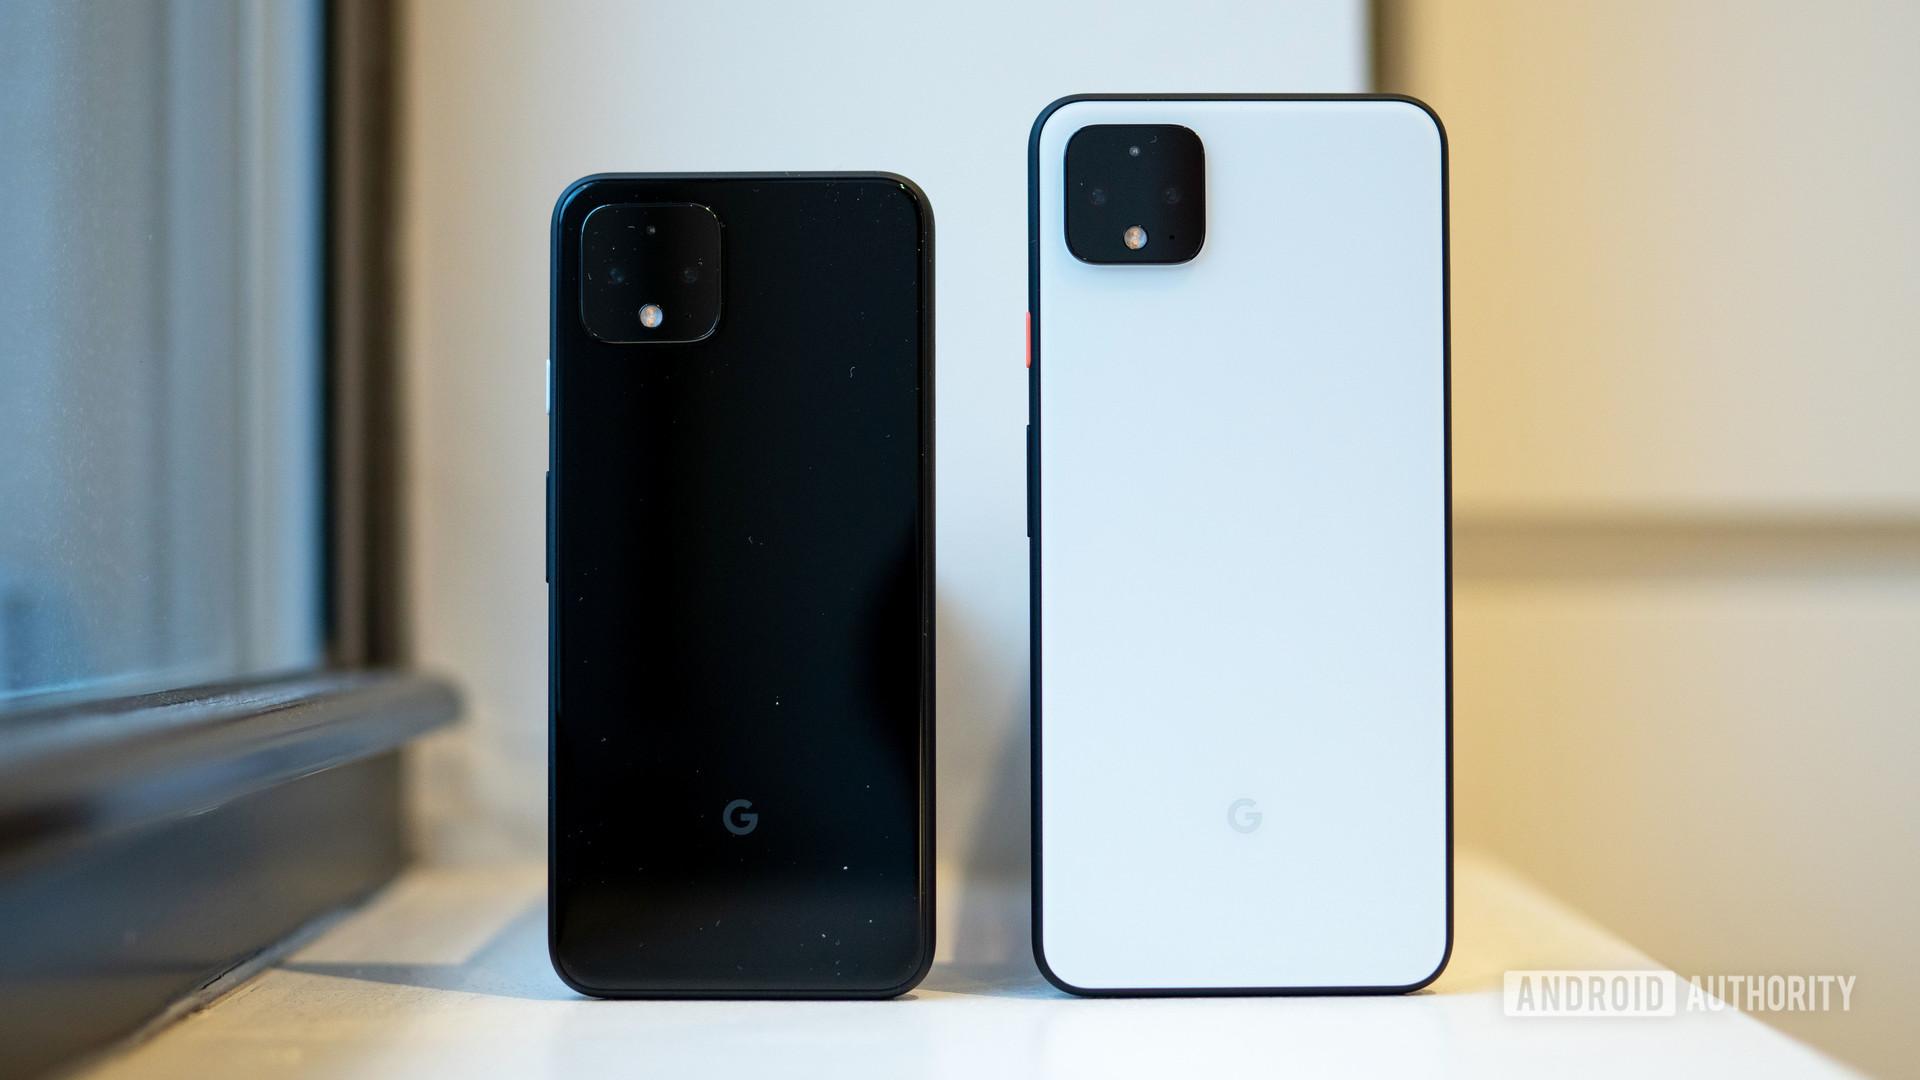 Google Pixel 4 vs Google Pixel 4 XL from the back